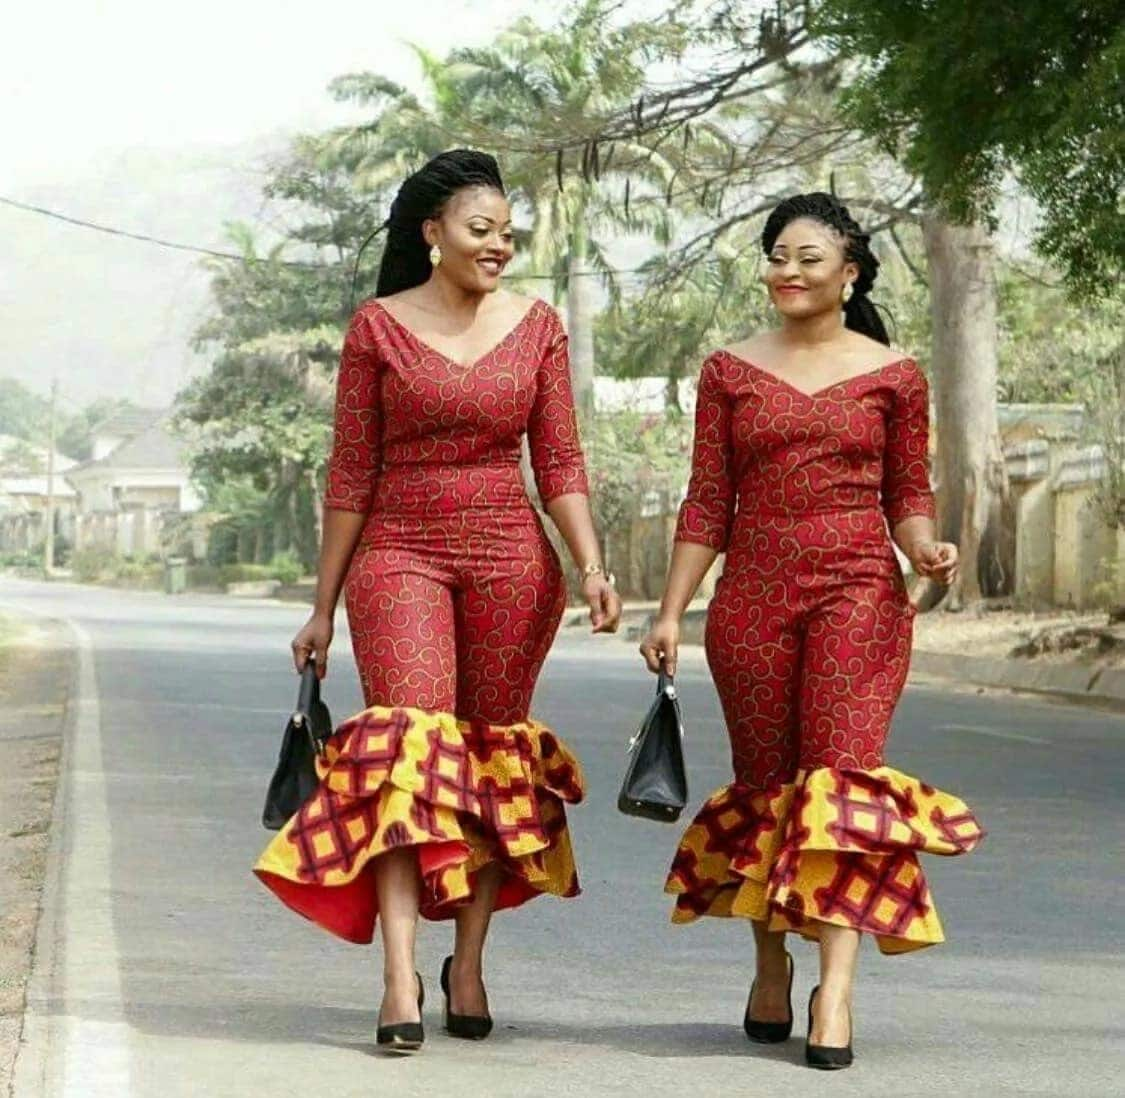 New Ghanaian African Wear Styles 2019 Yen.com.gh